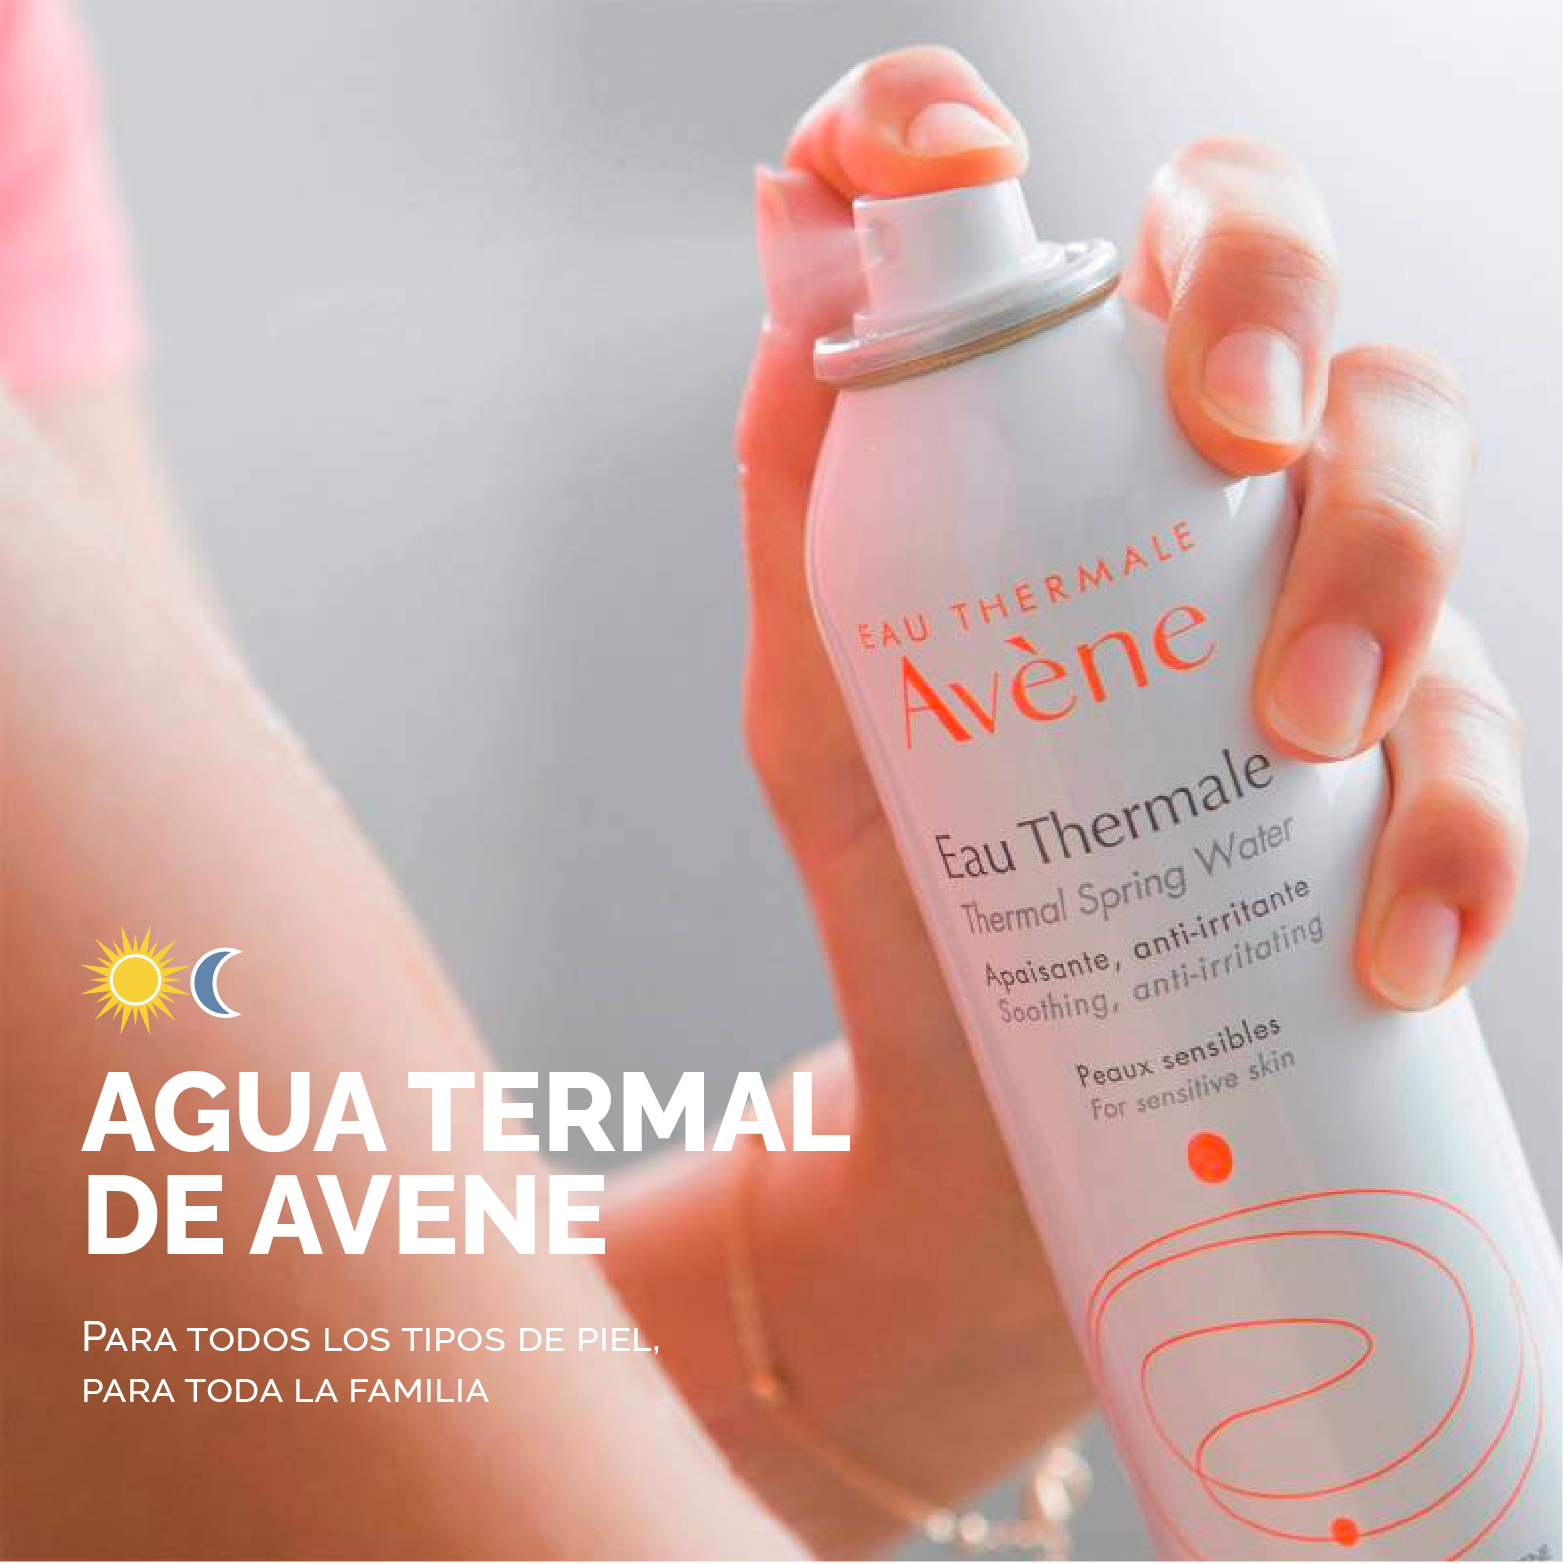 Agua thermal Avene®